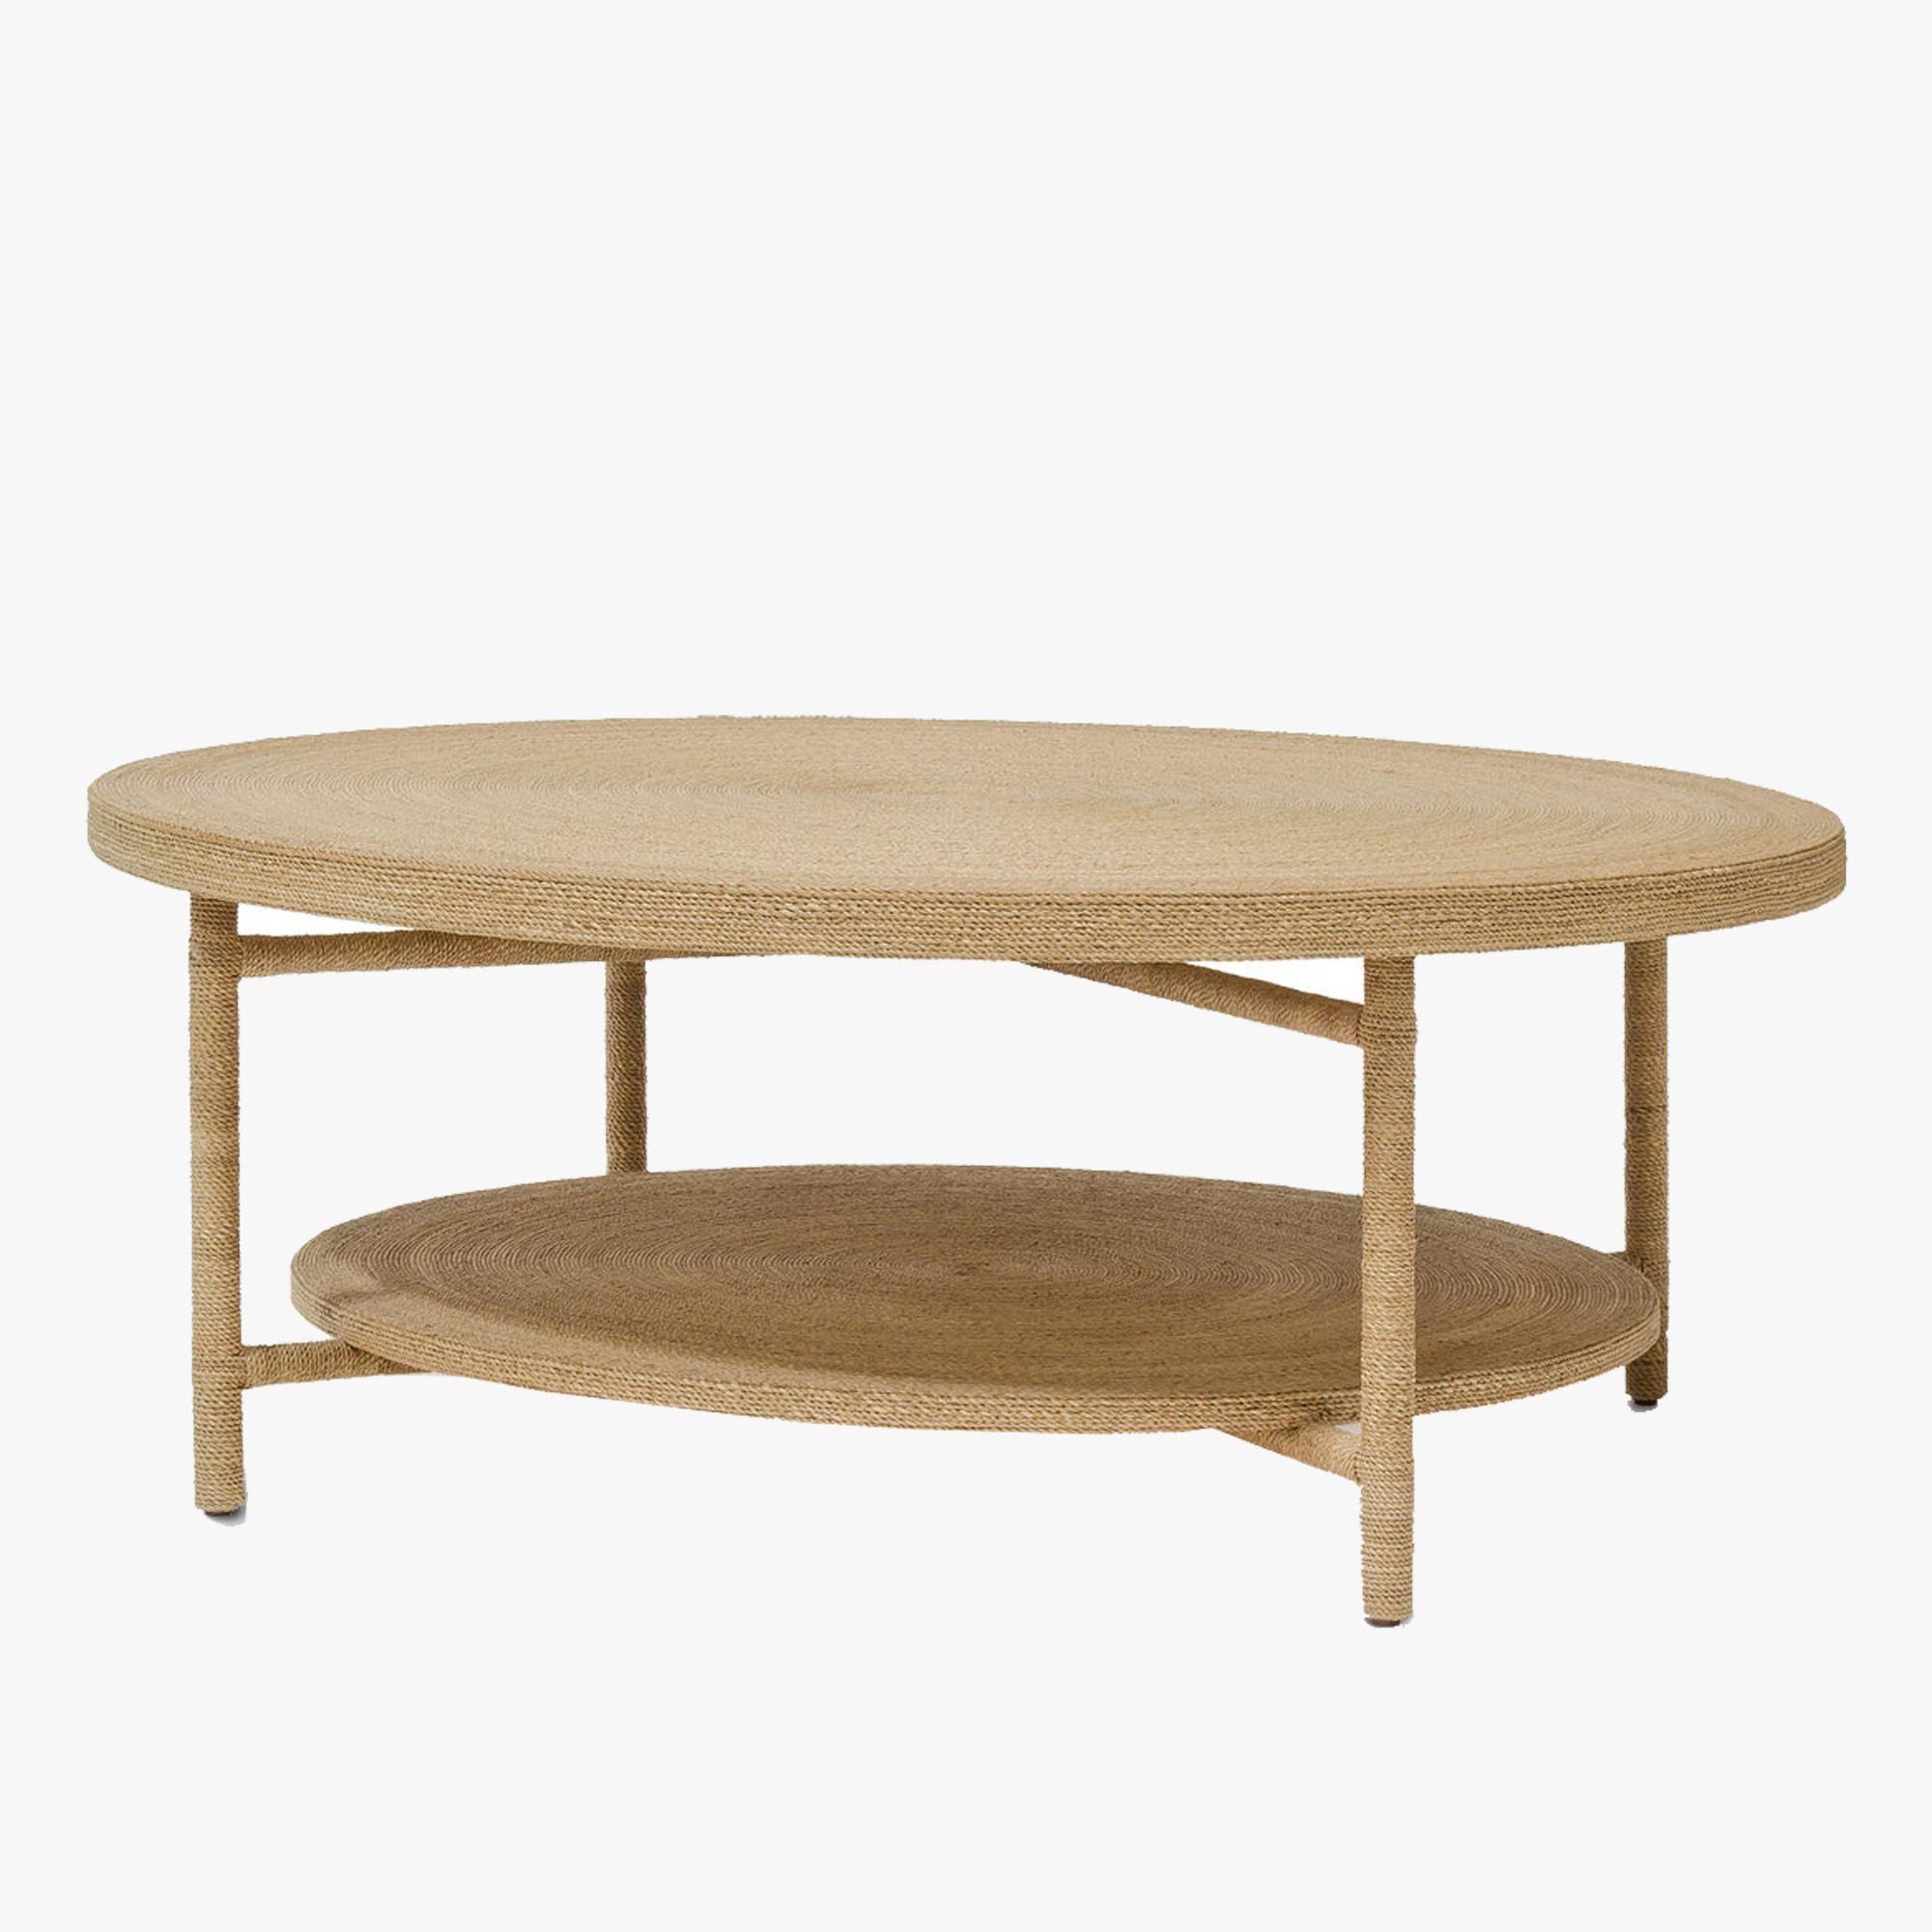 Monarch Seagrass Coffee Table Shop Palecek Tables Contemporary